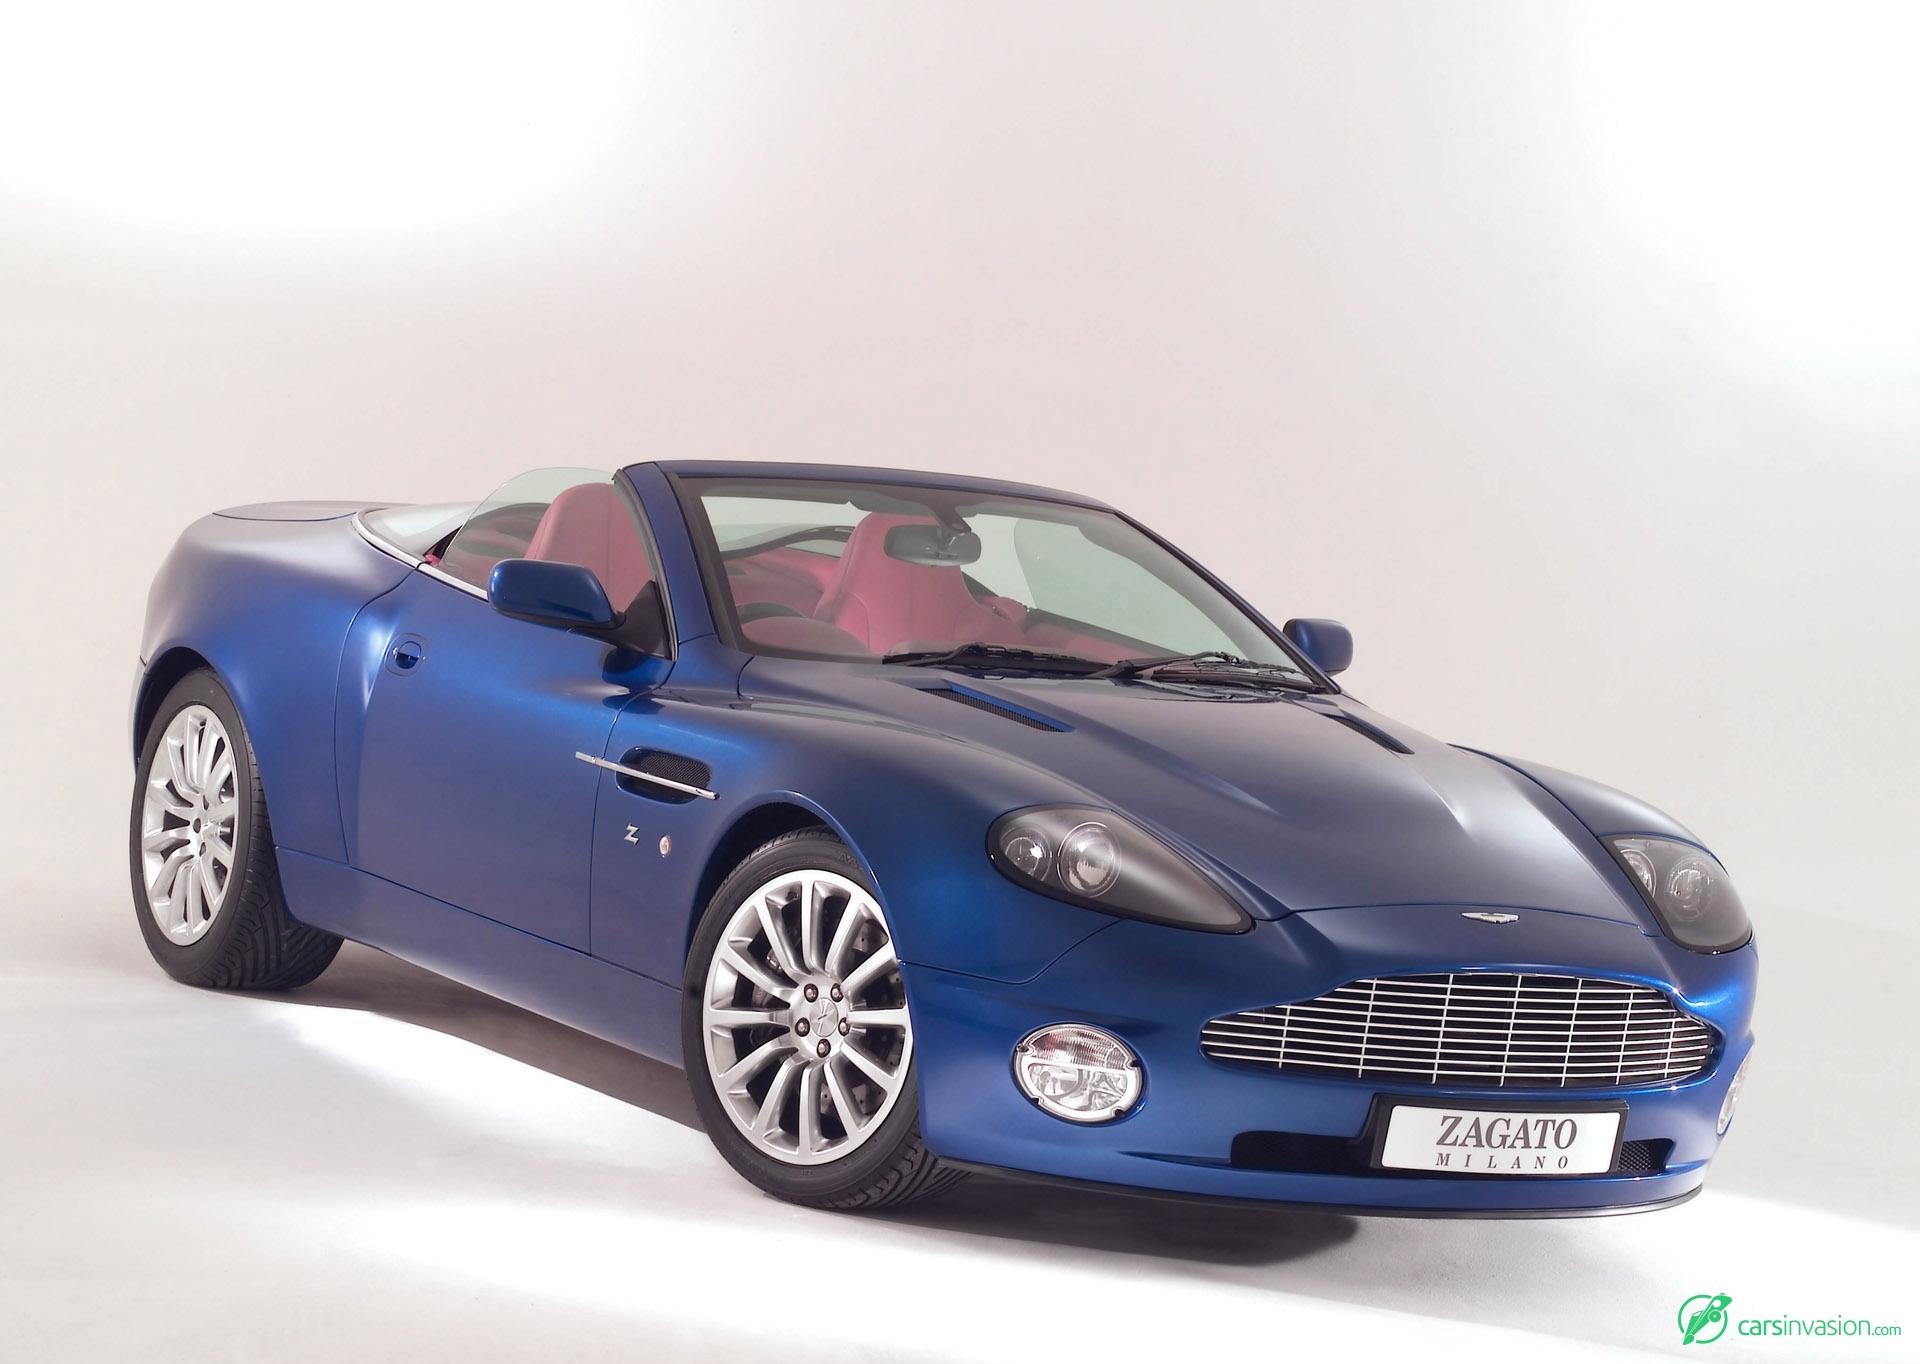 Zagato Aston Martin Vanquish Roadster HD Pictures - 2004 aston martin vanquish